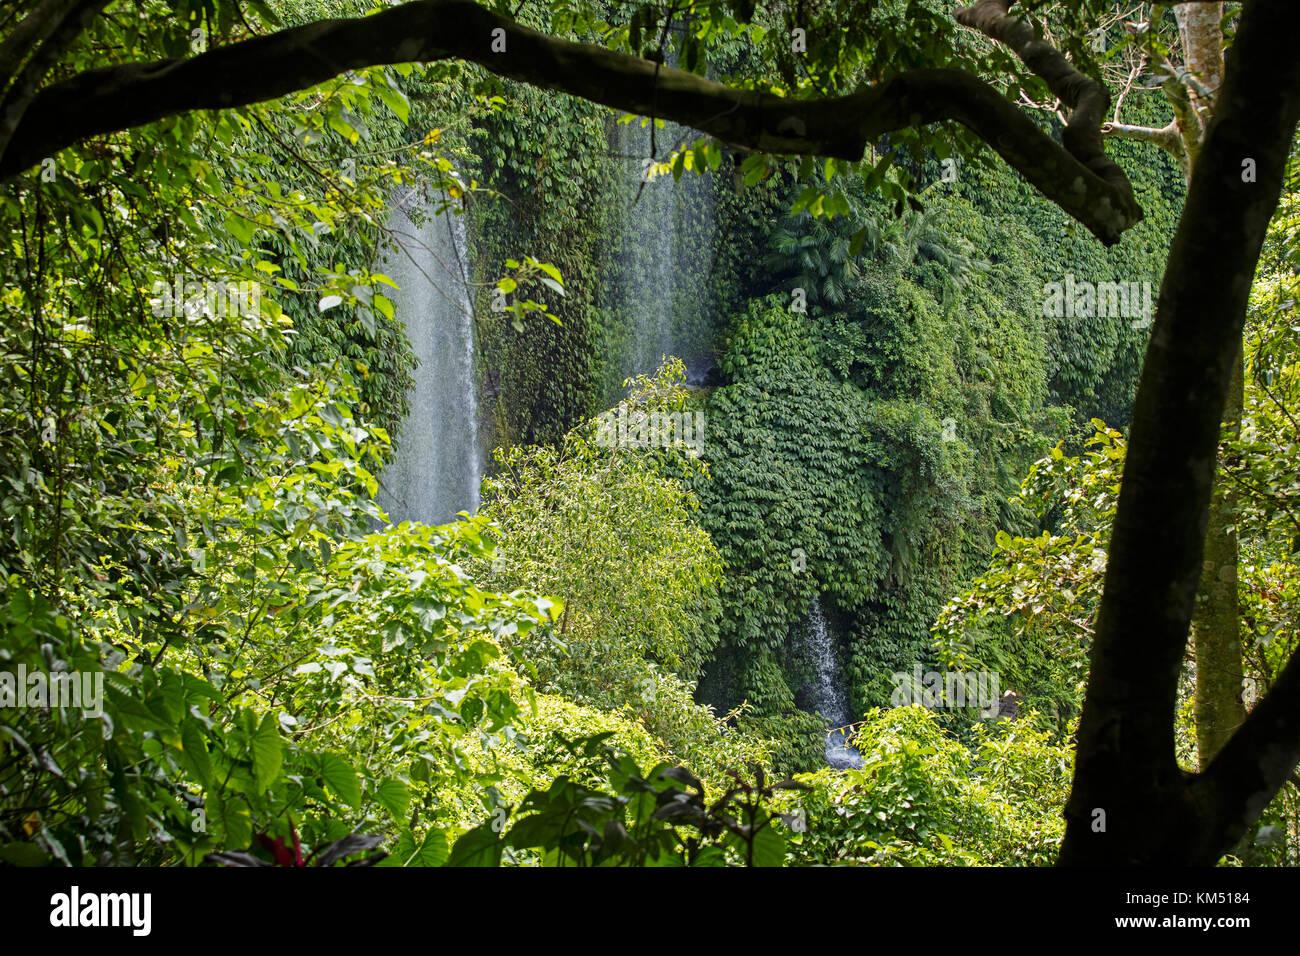 Benang Kelambu Waterfalls in tropical forest near the village Aik Berik, North Batukliang, Central Lombok, Indonesia - Stock Image